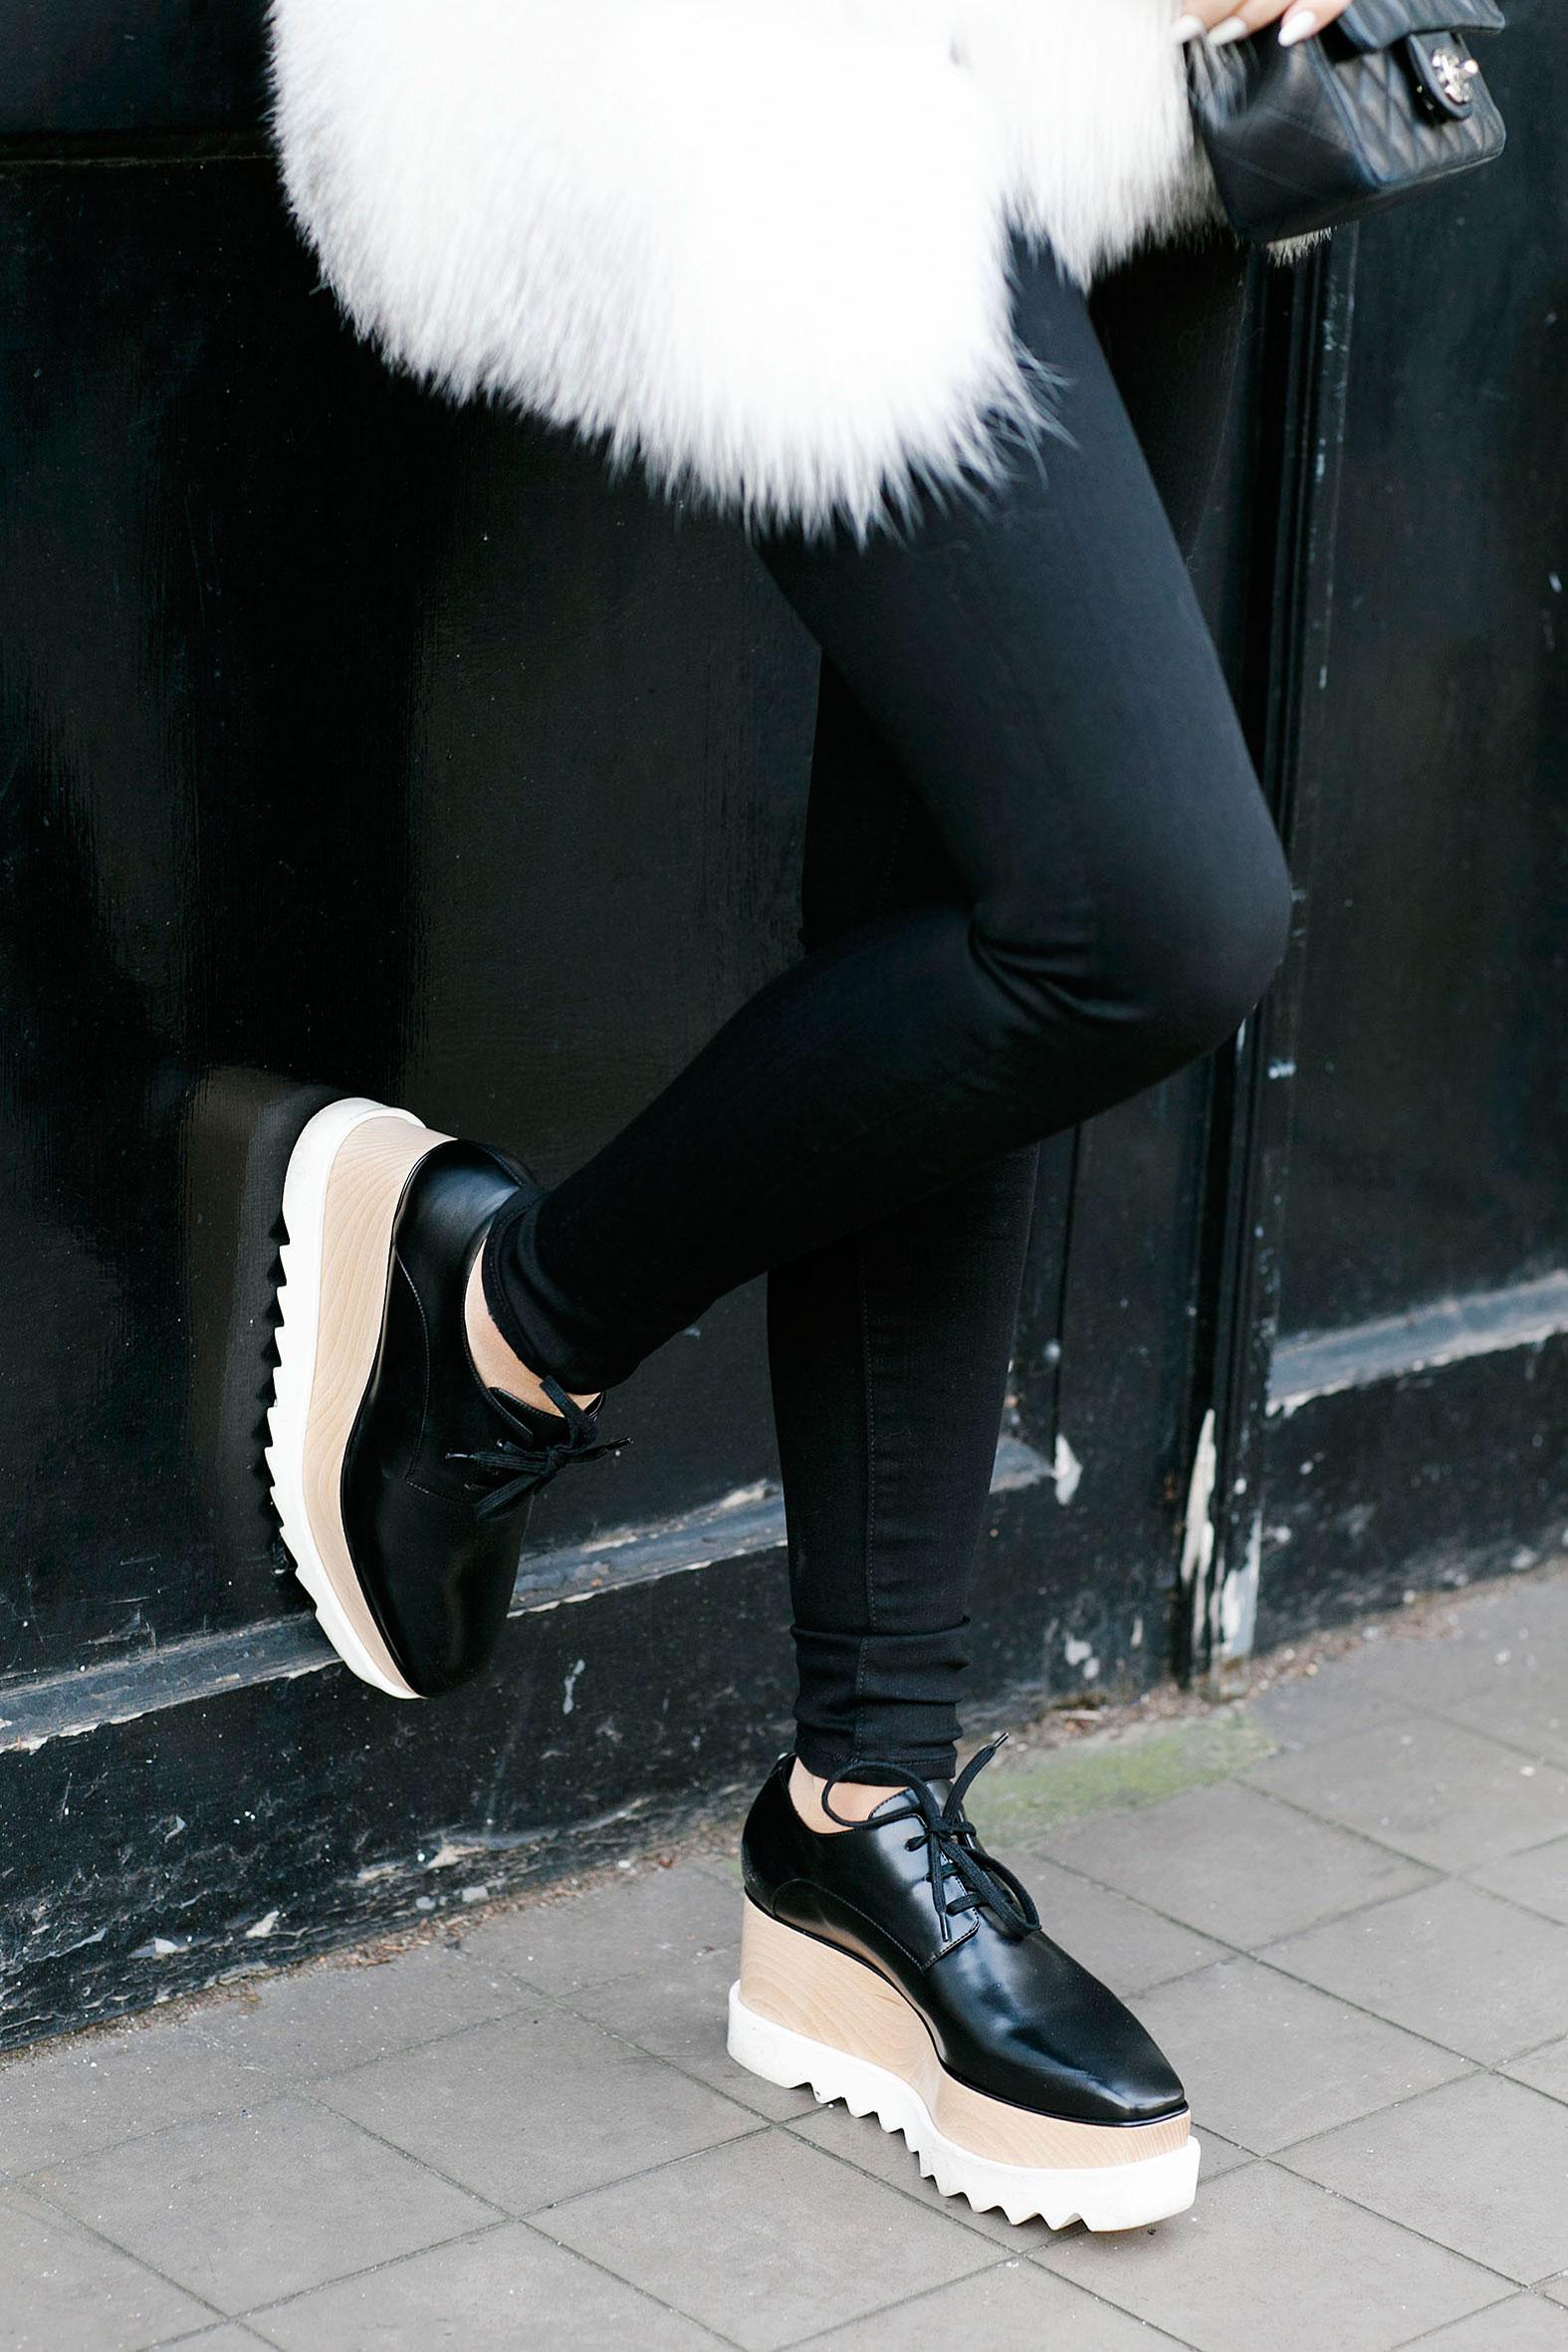 7 More Minutes. Fashion, travel and lifestyle blog by Alyona Gasimova. Flatforms. Stella McCartney. www.7moreminutes.com